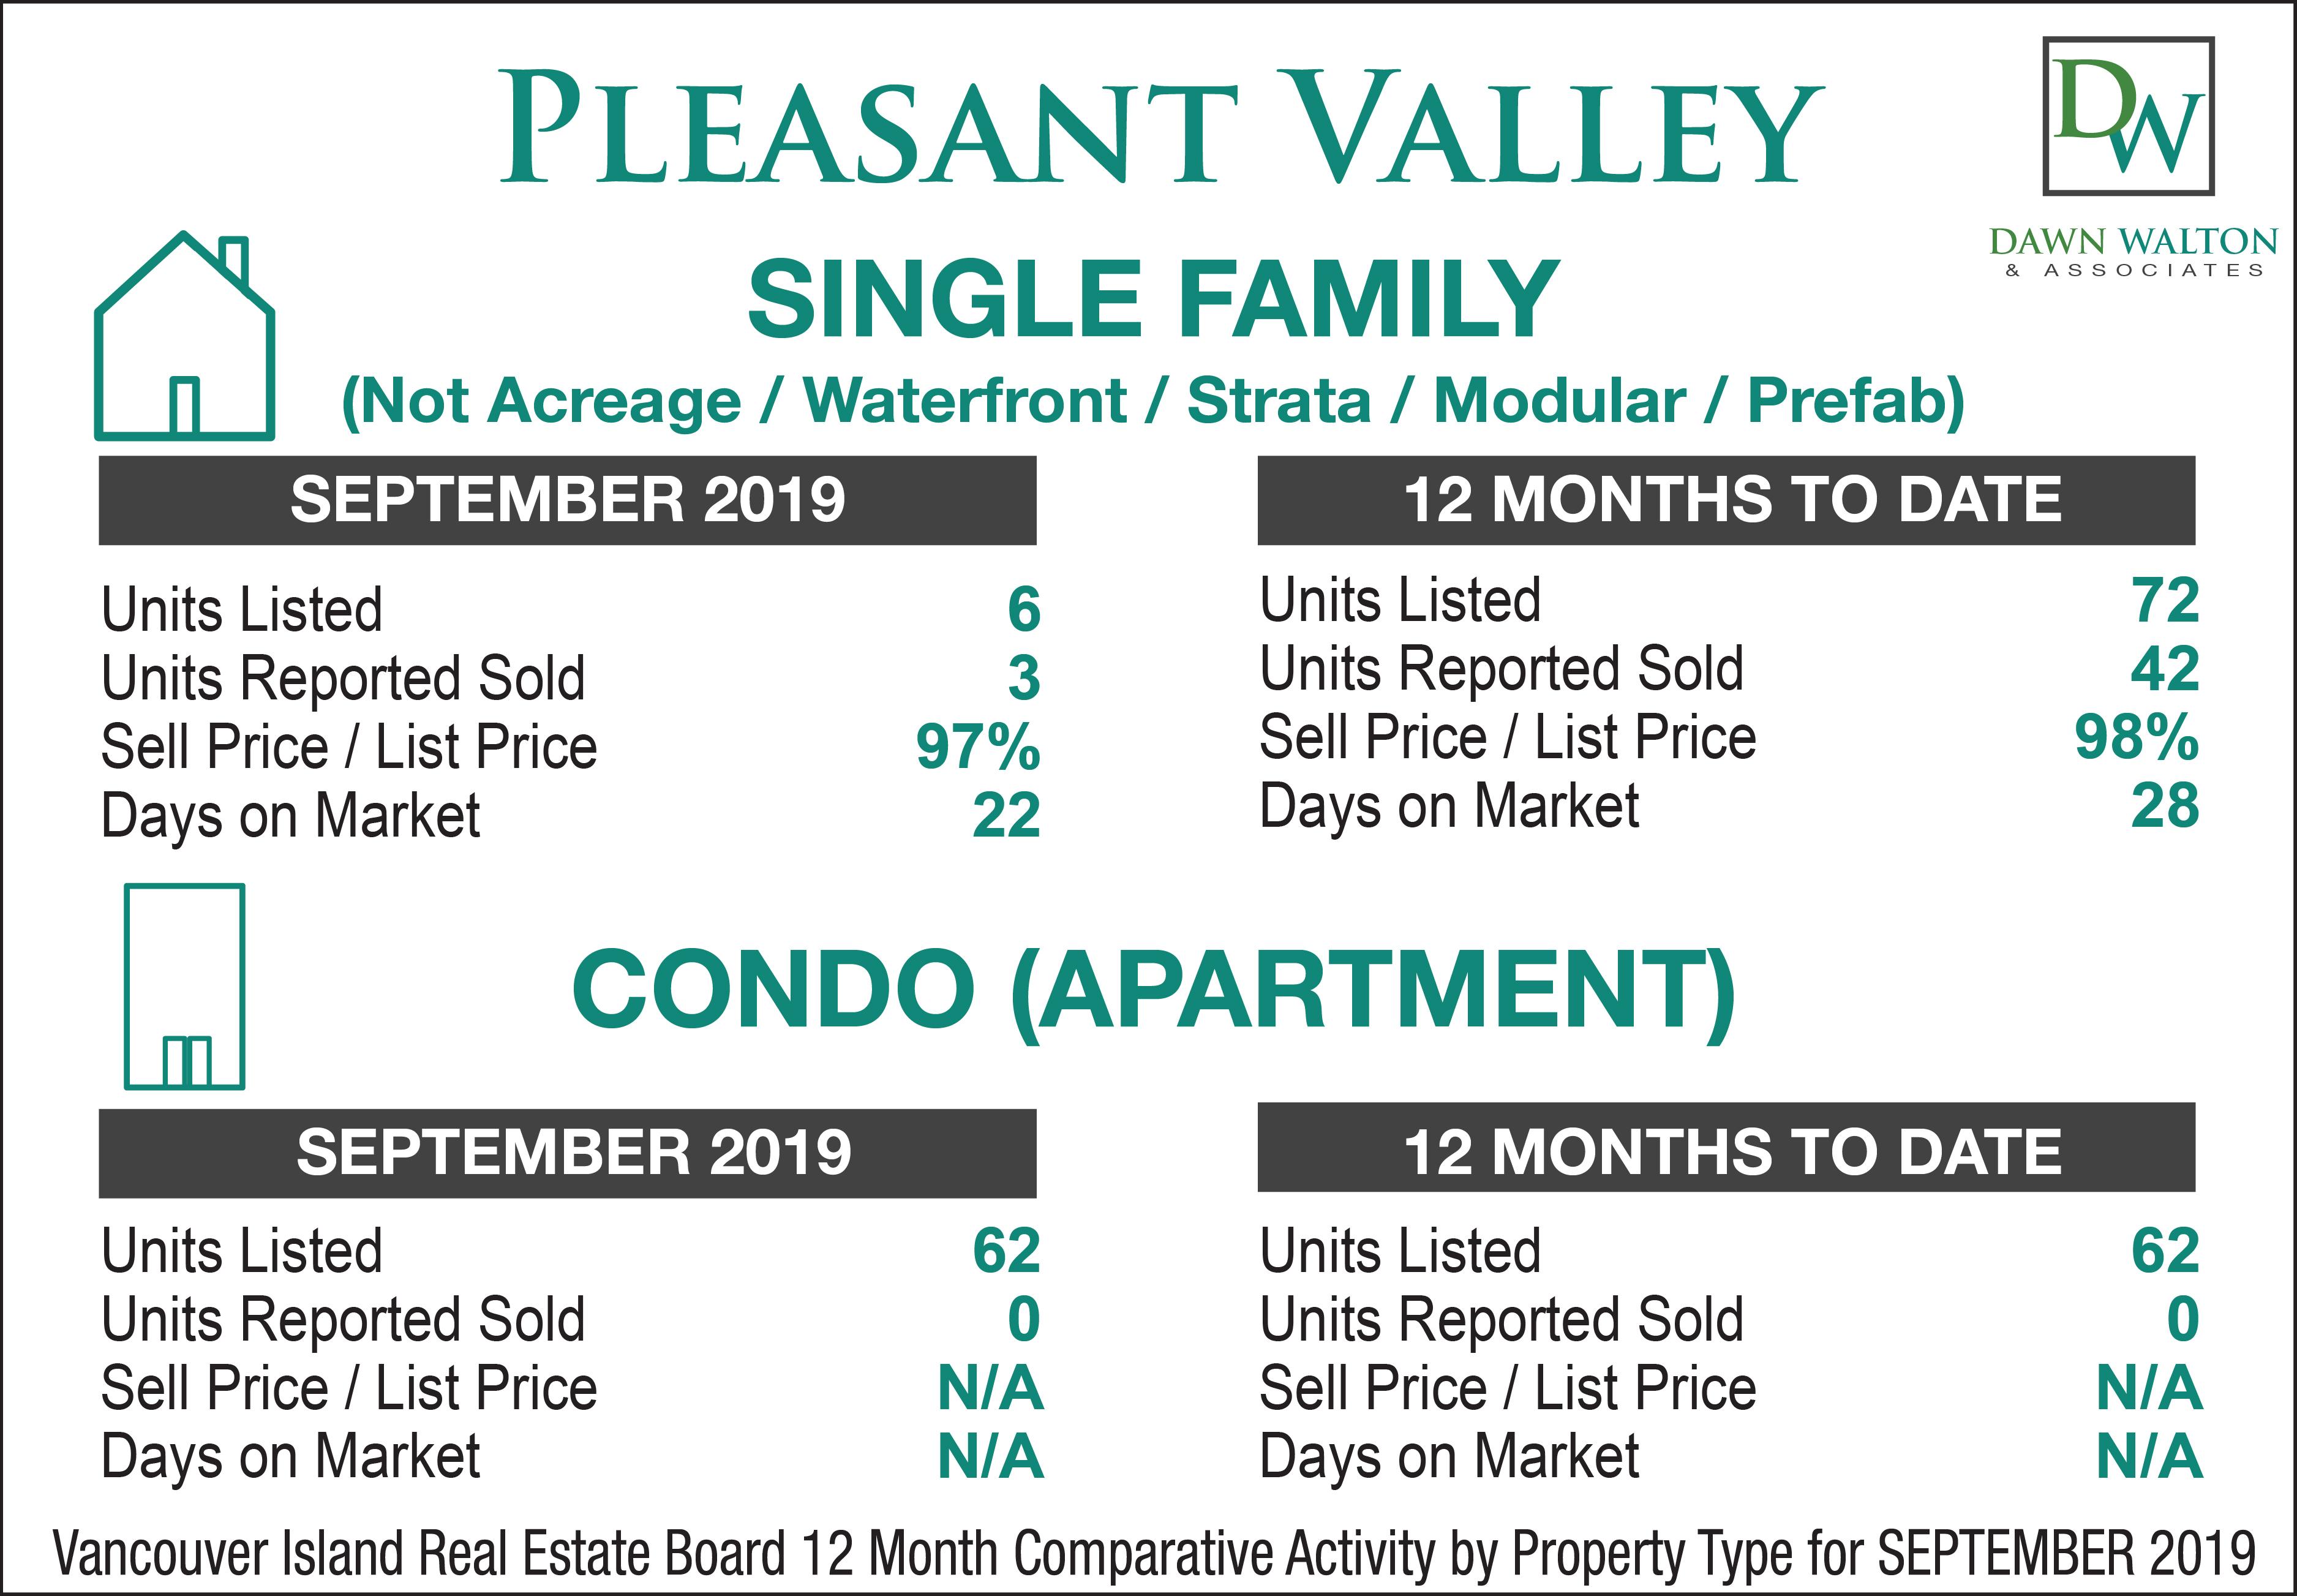 Pleasant Valley Real Estate Market Stats September 2019 - Nanaimo Realtor Dawn Walton